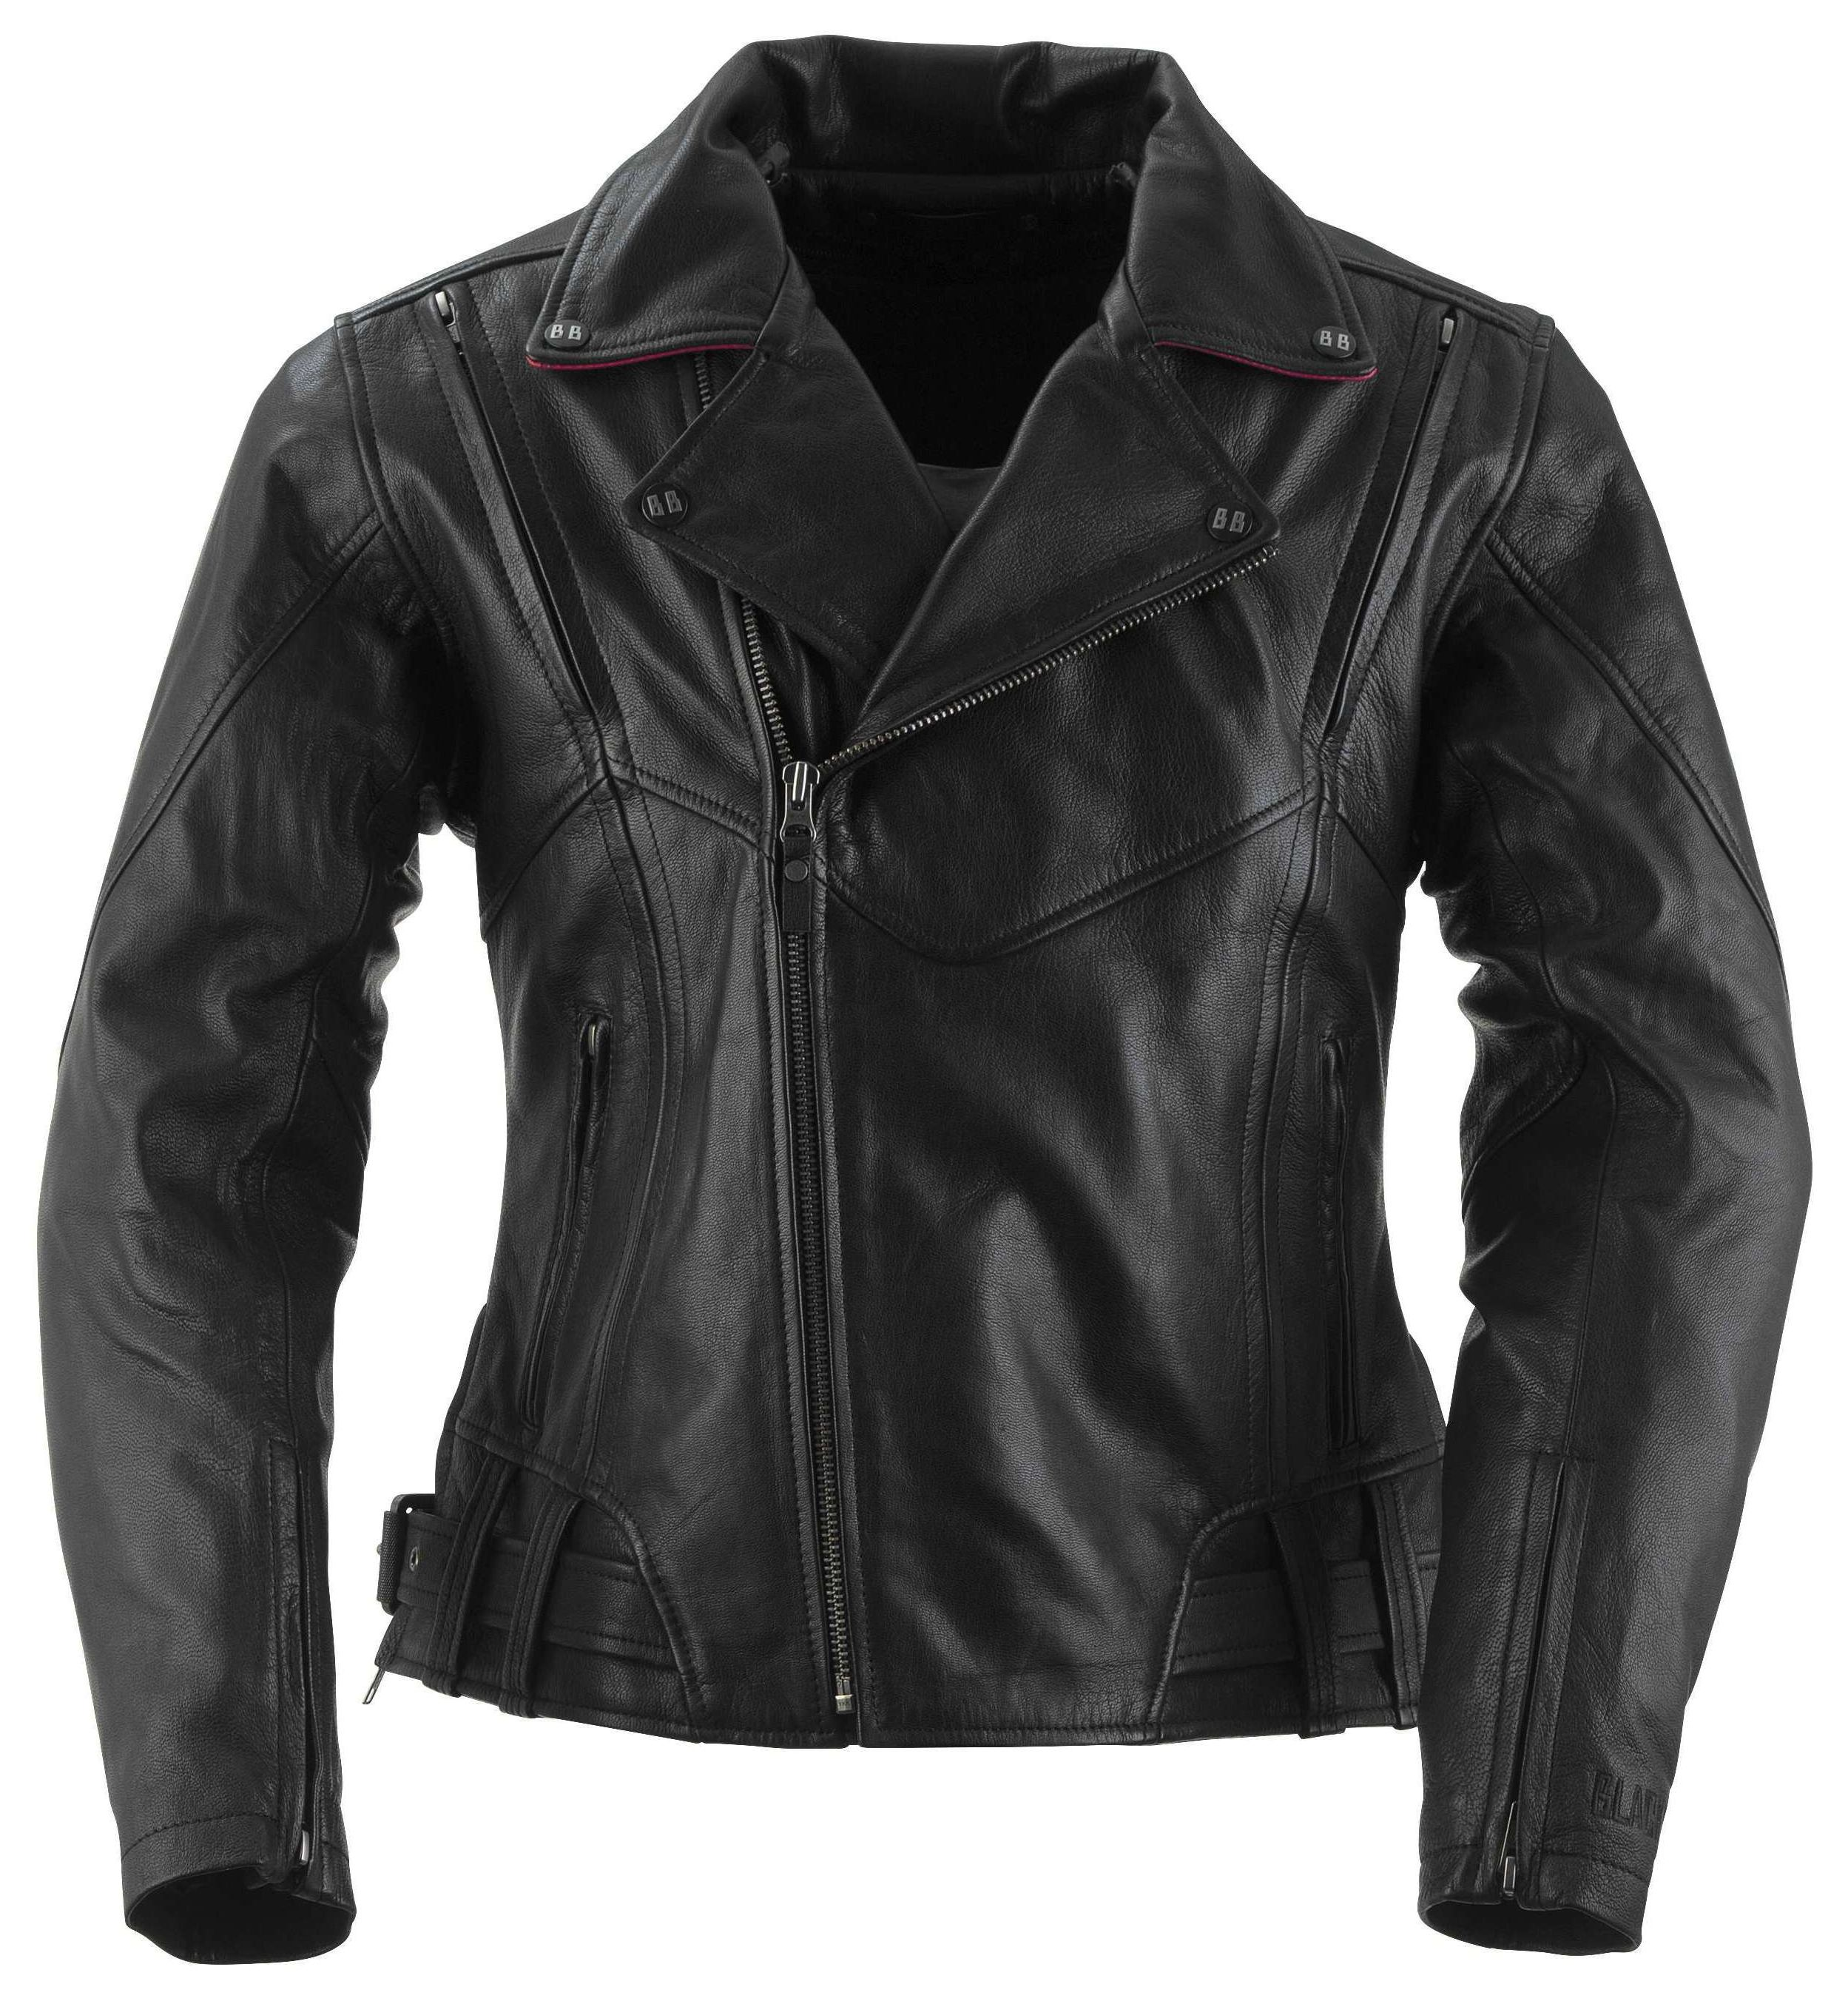 Leather jacket sale - Leather Jacket Sale 18